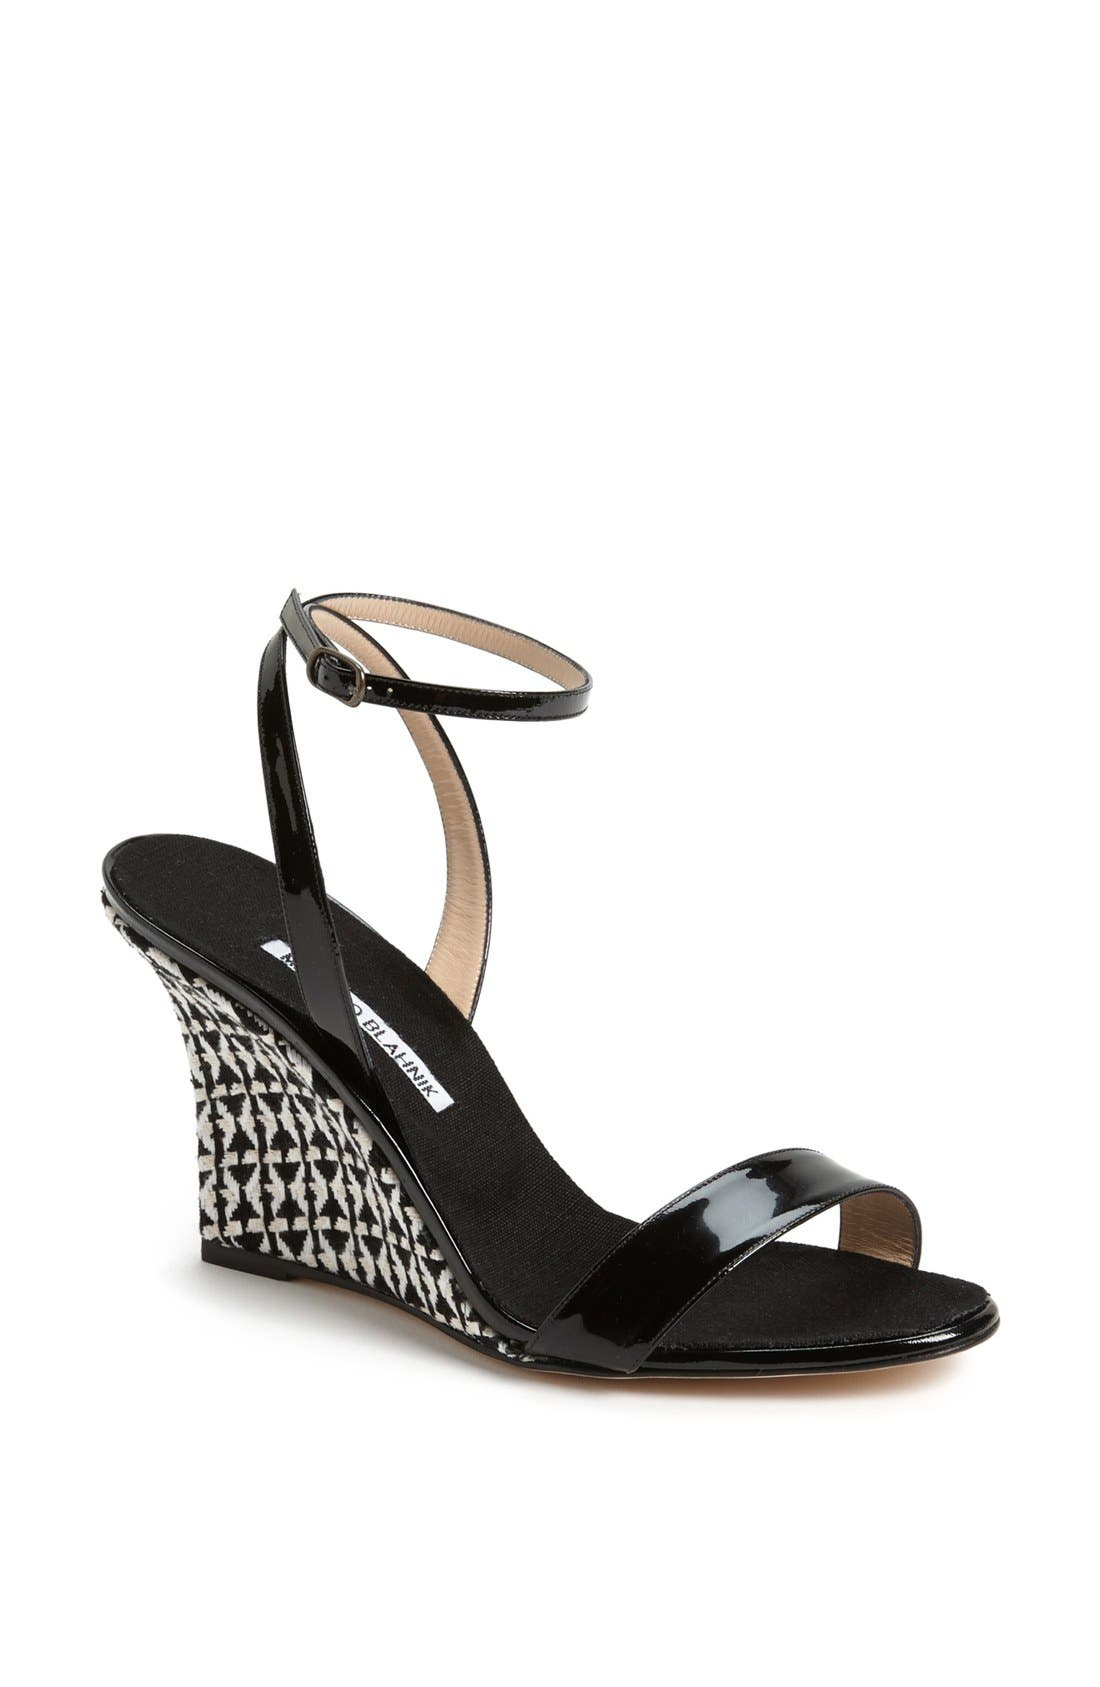 Main Image - Manolo Blahnik 'Ribera' Wedge Sandal